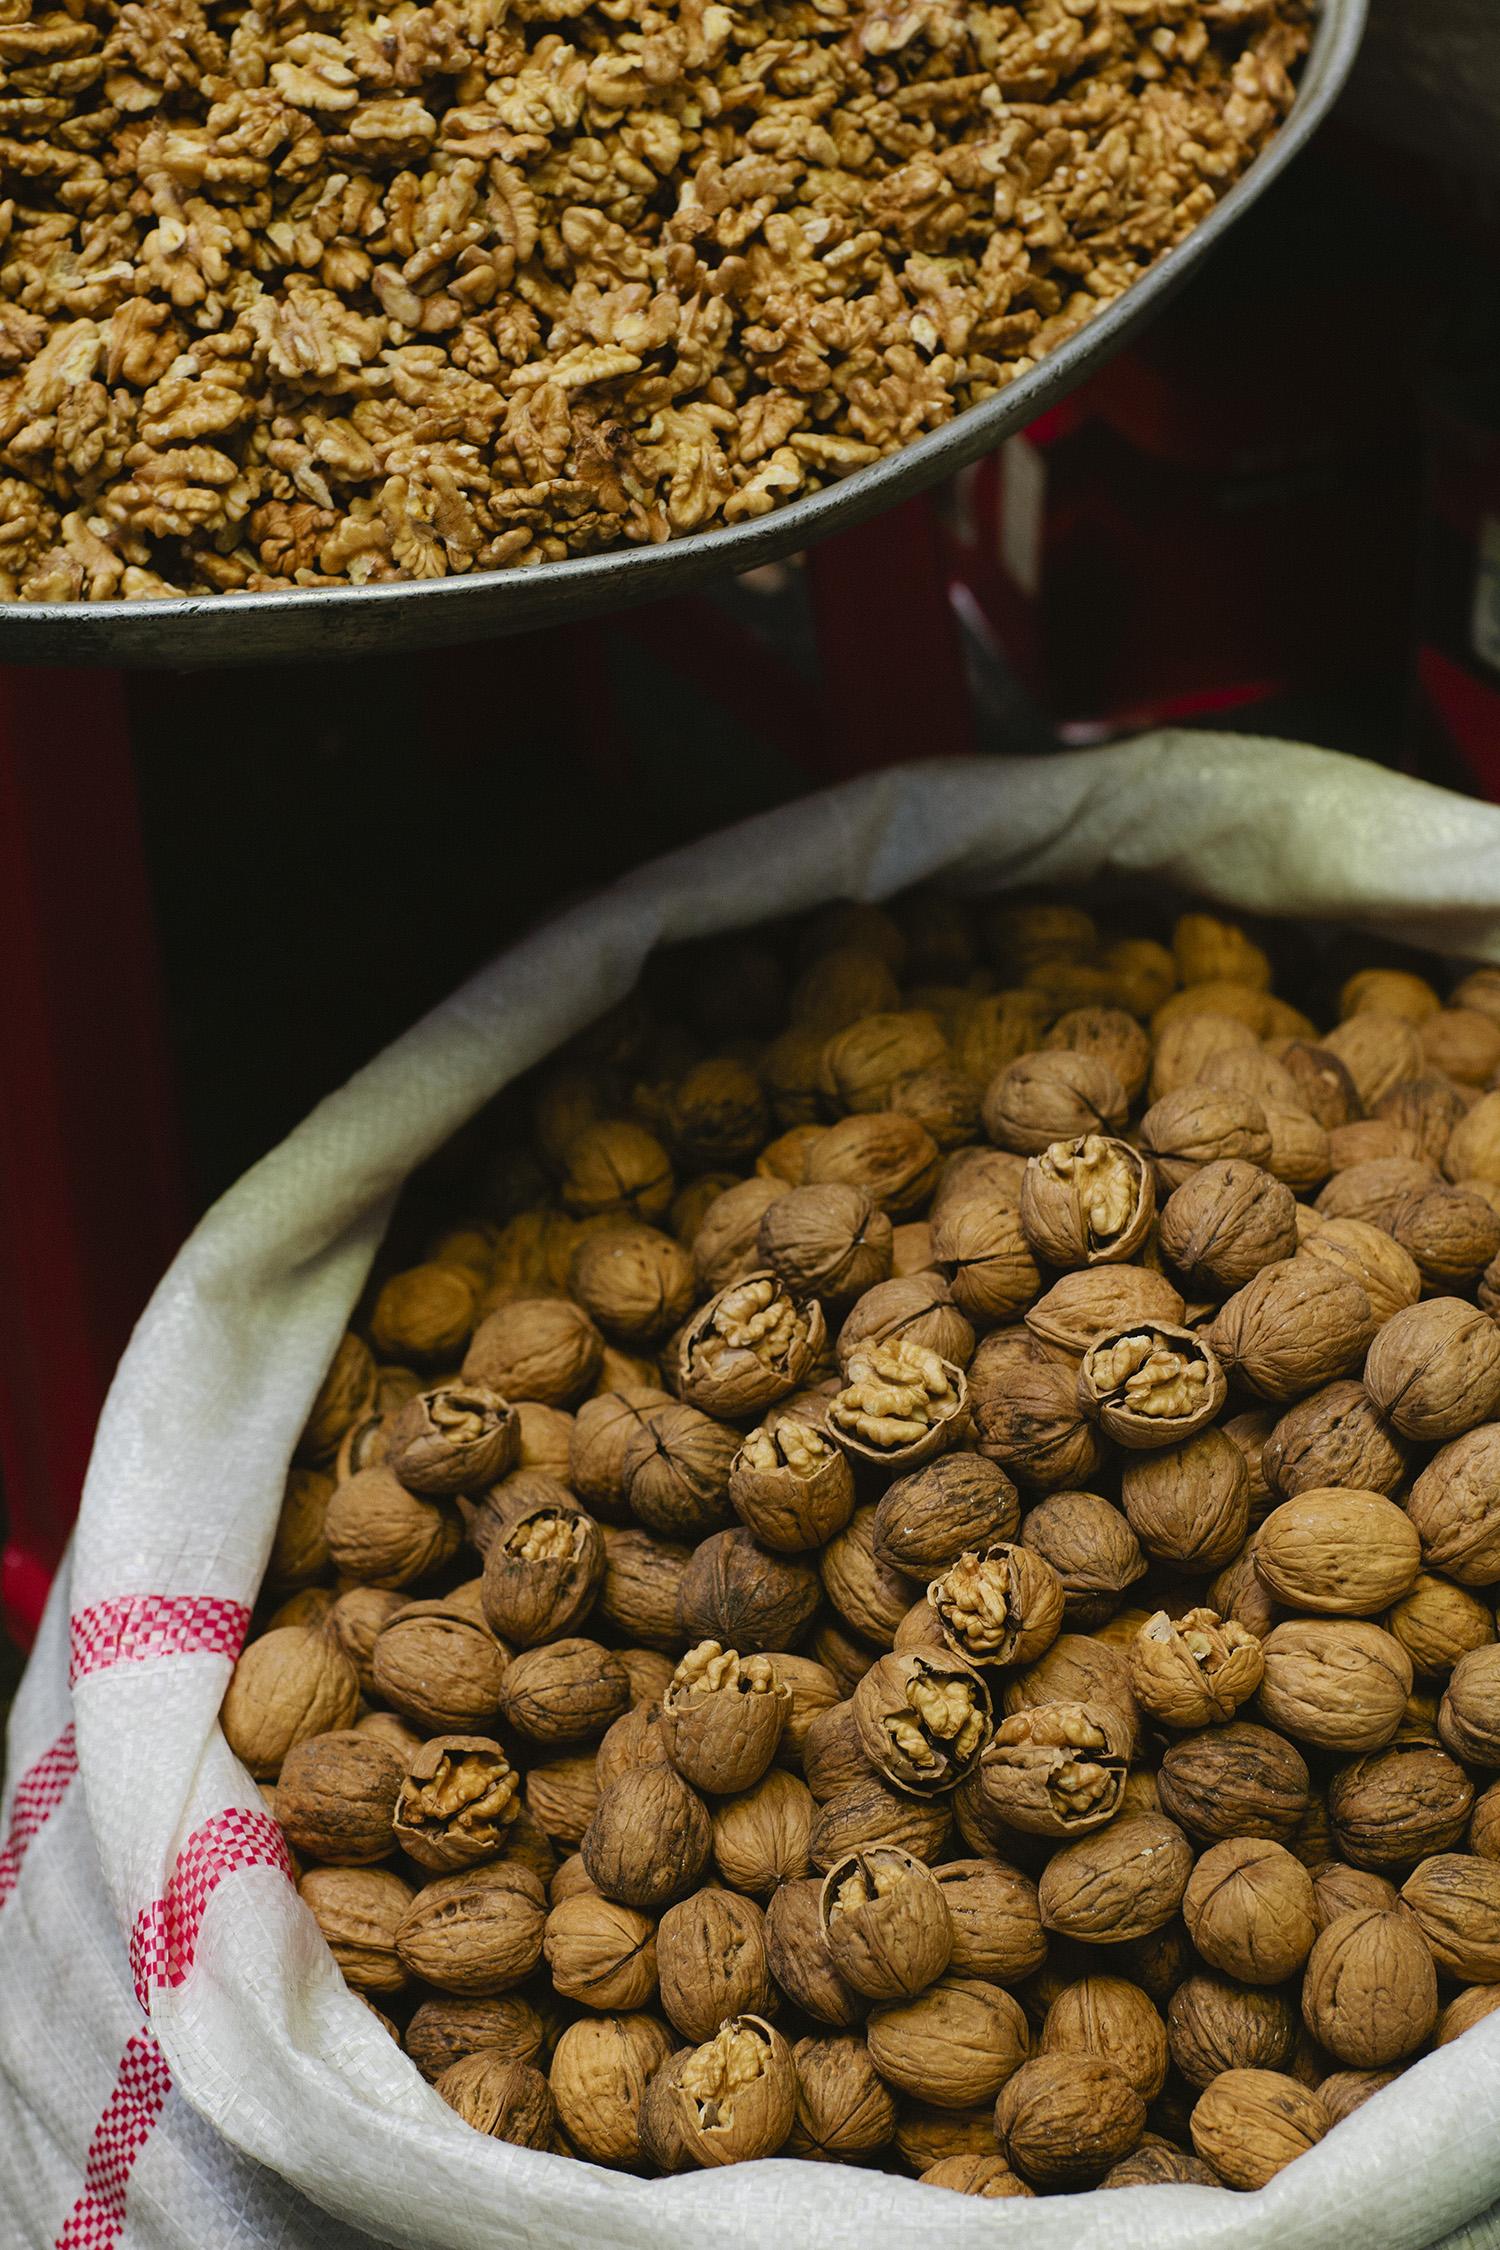 lifestyle-editorial-travel-washington-dc-malek-naz-photography-walnuts-tehran-bazaar.jpg